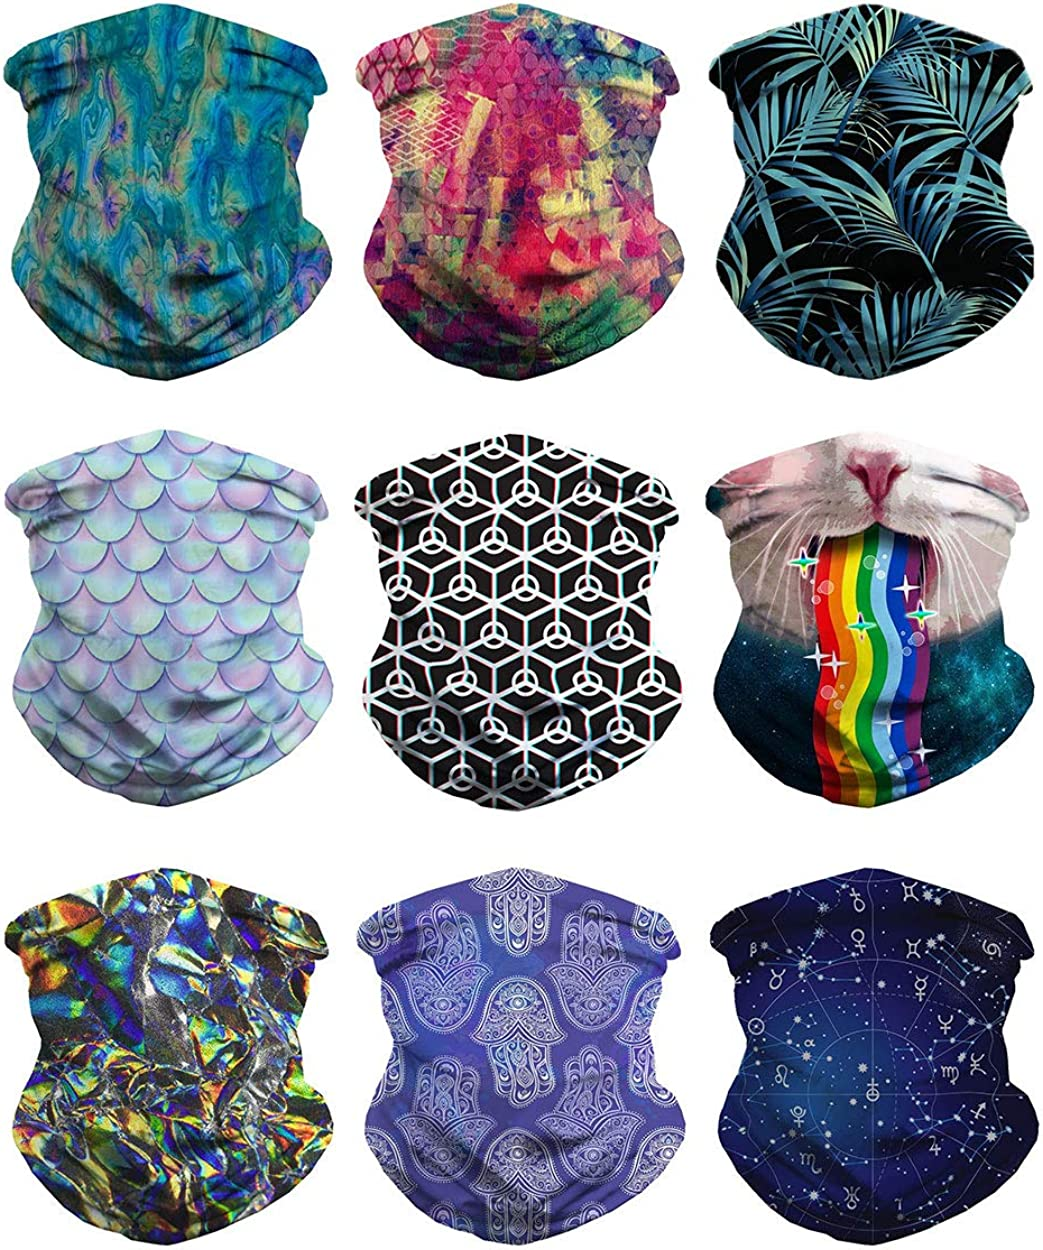 Buff Round Kaleidoscope Patterns Original Mutifunctional Microfiber Headwear